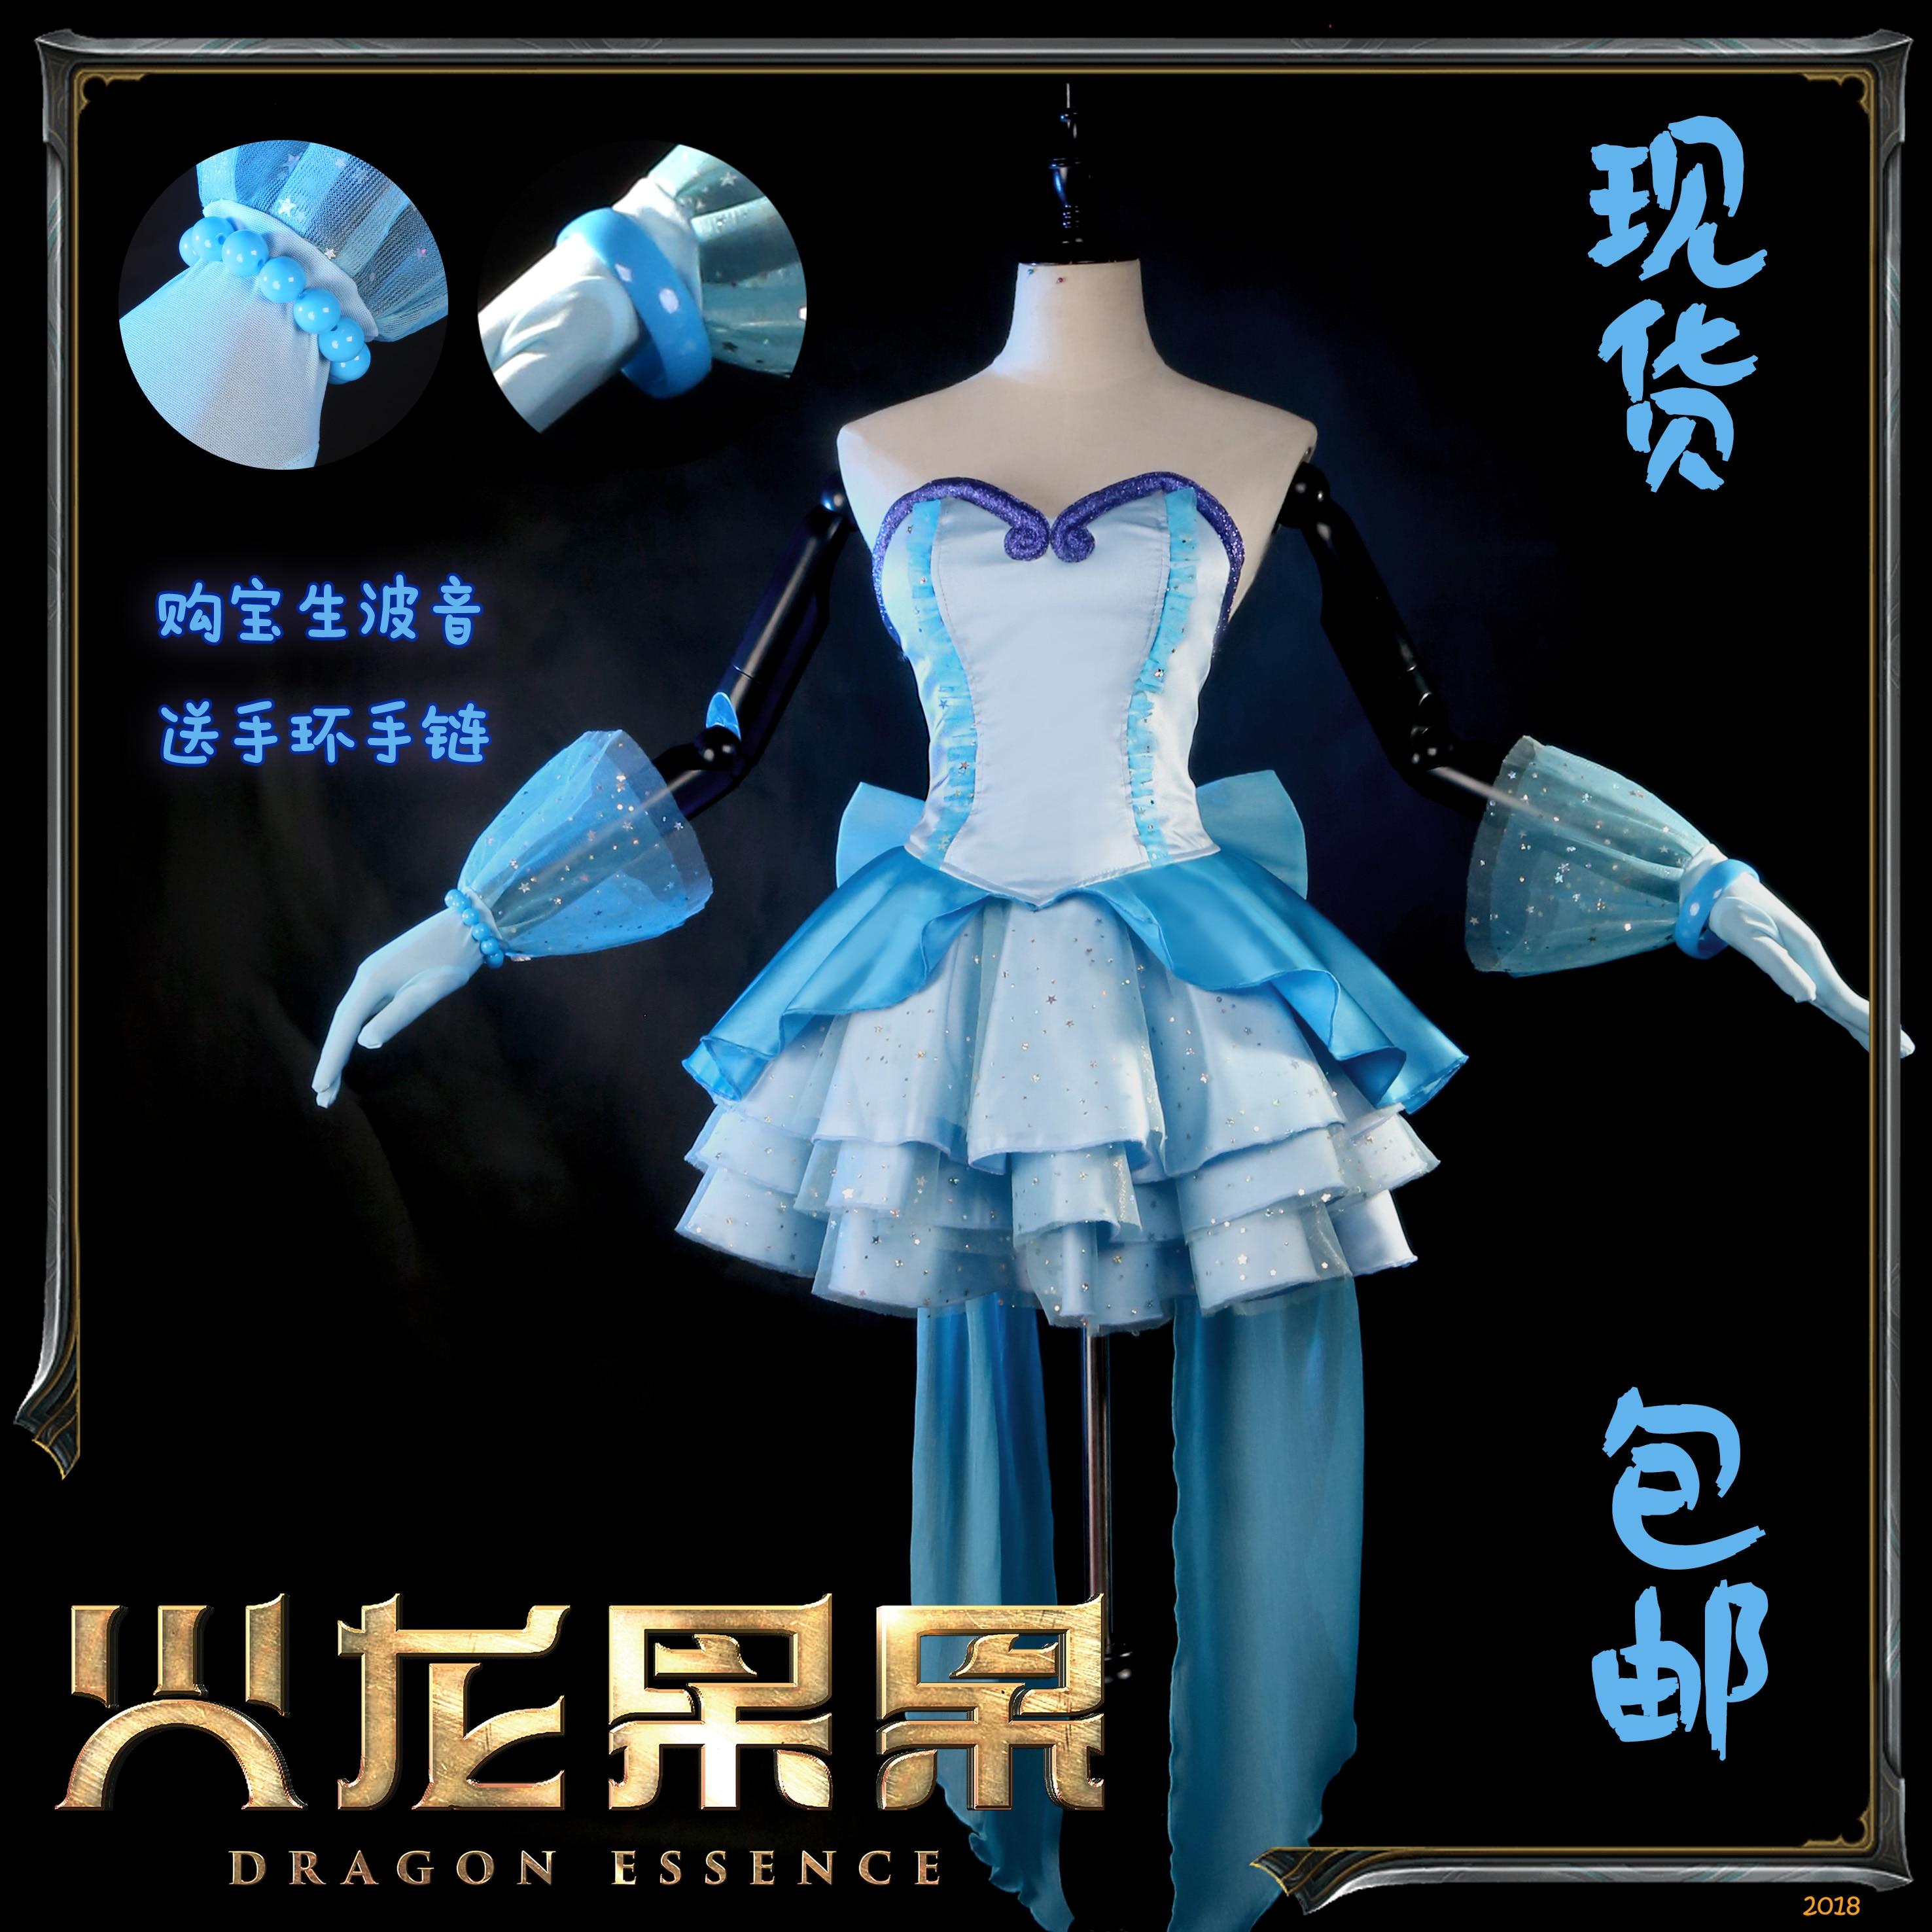 Mermaid Melody Pichi Pichi Pitch Hanon Hosho Gorgeous Uniform Cosplay Costume Party Lolita Dress